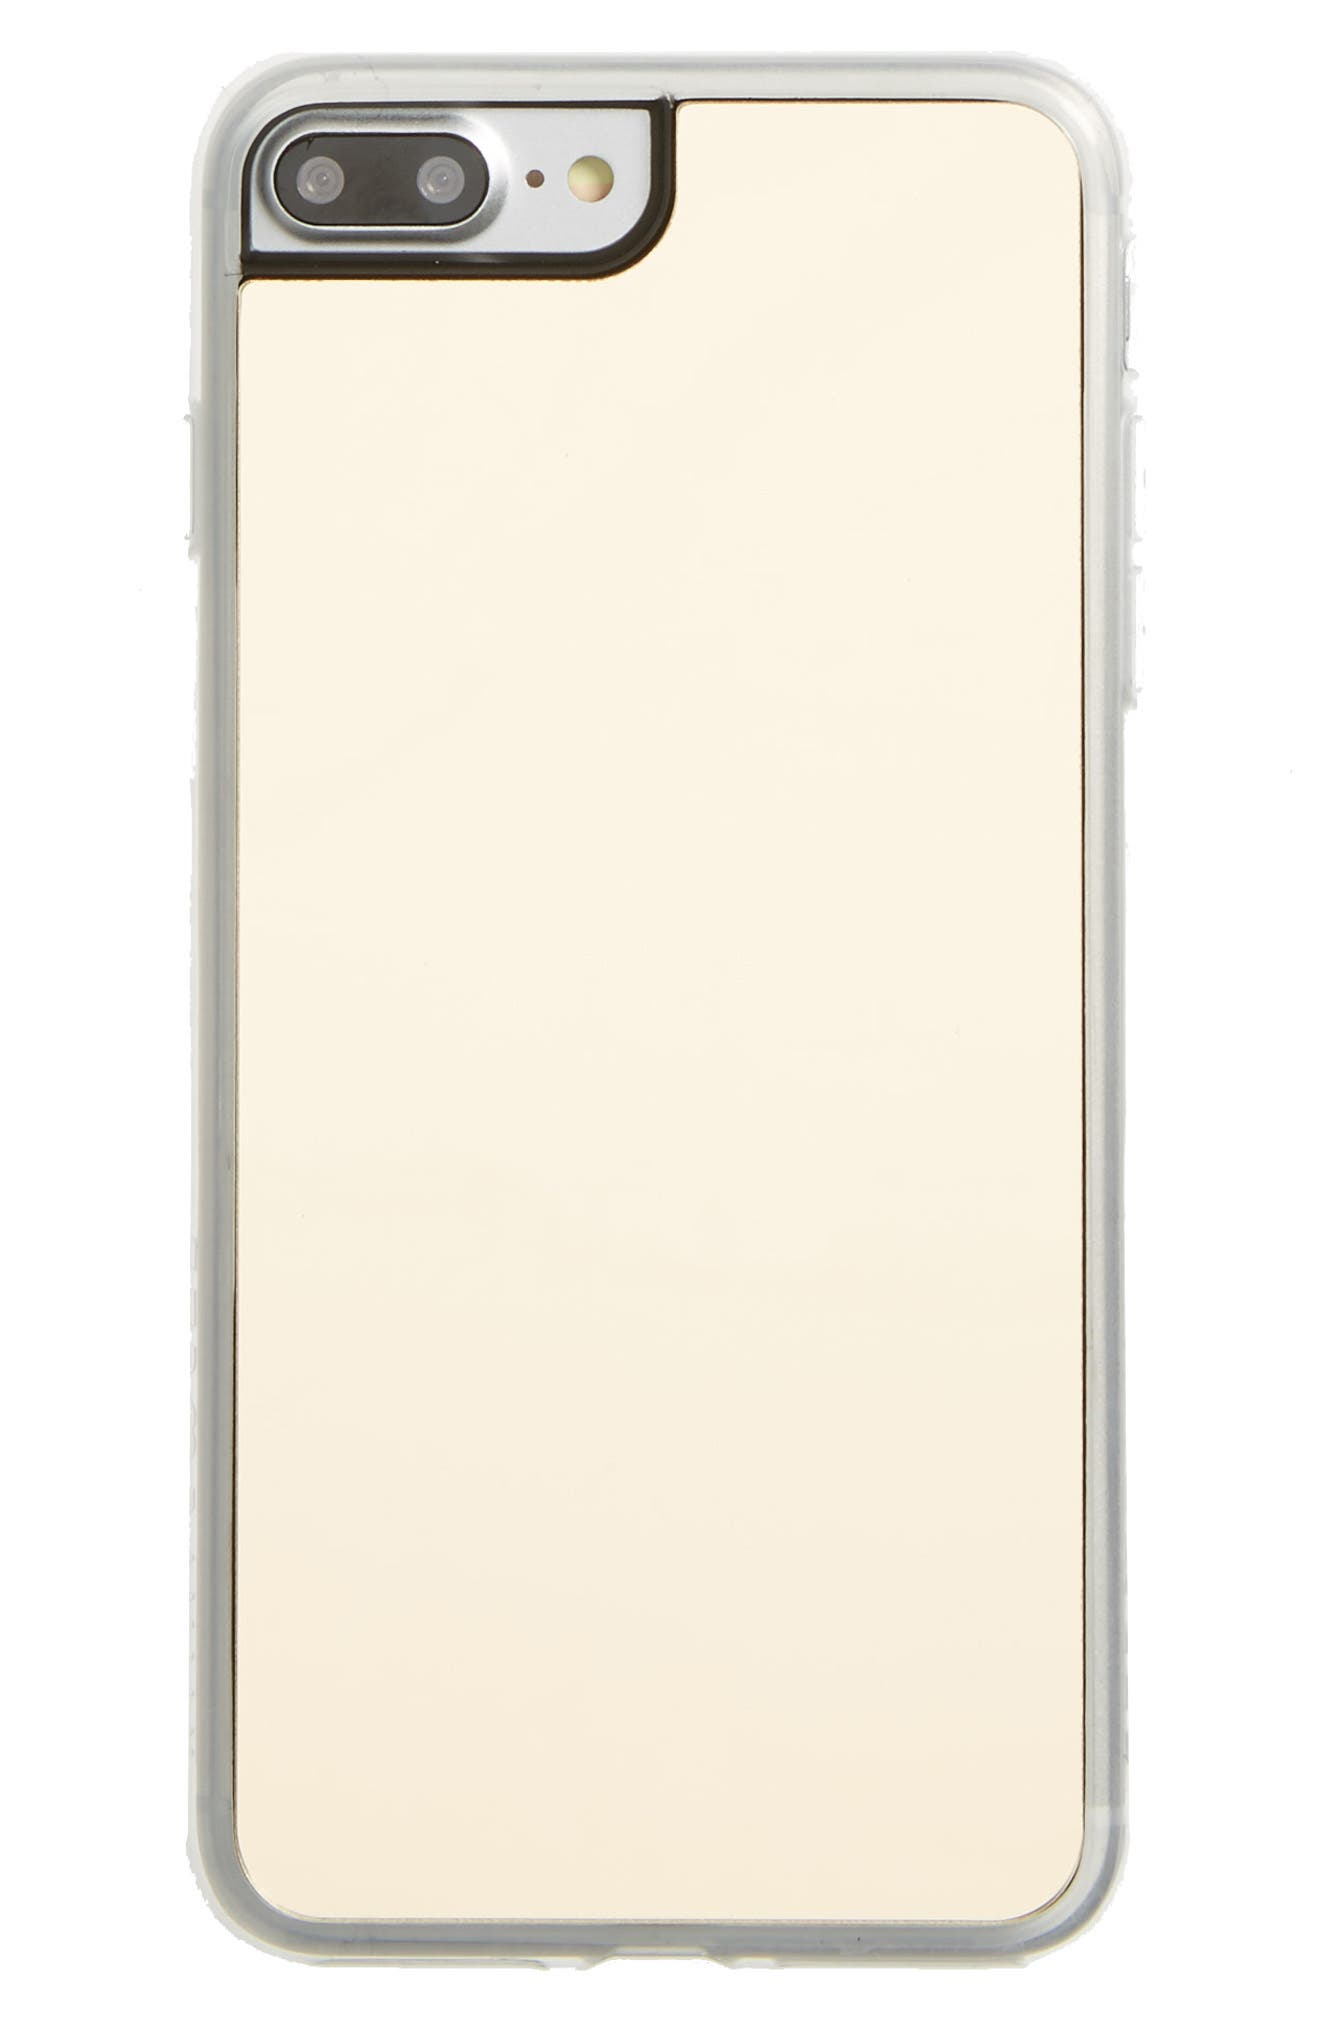 Zero Gravity Gold Mirror iPhone 7 & 7 Plus Case